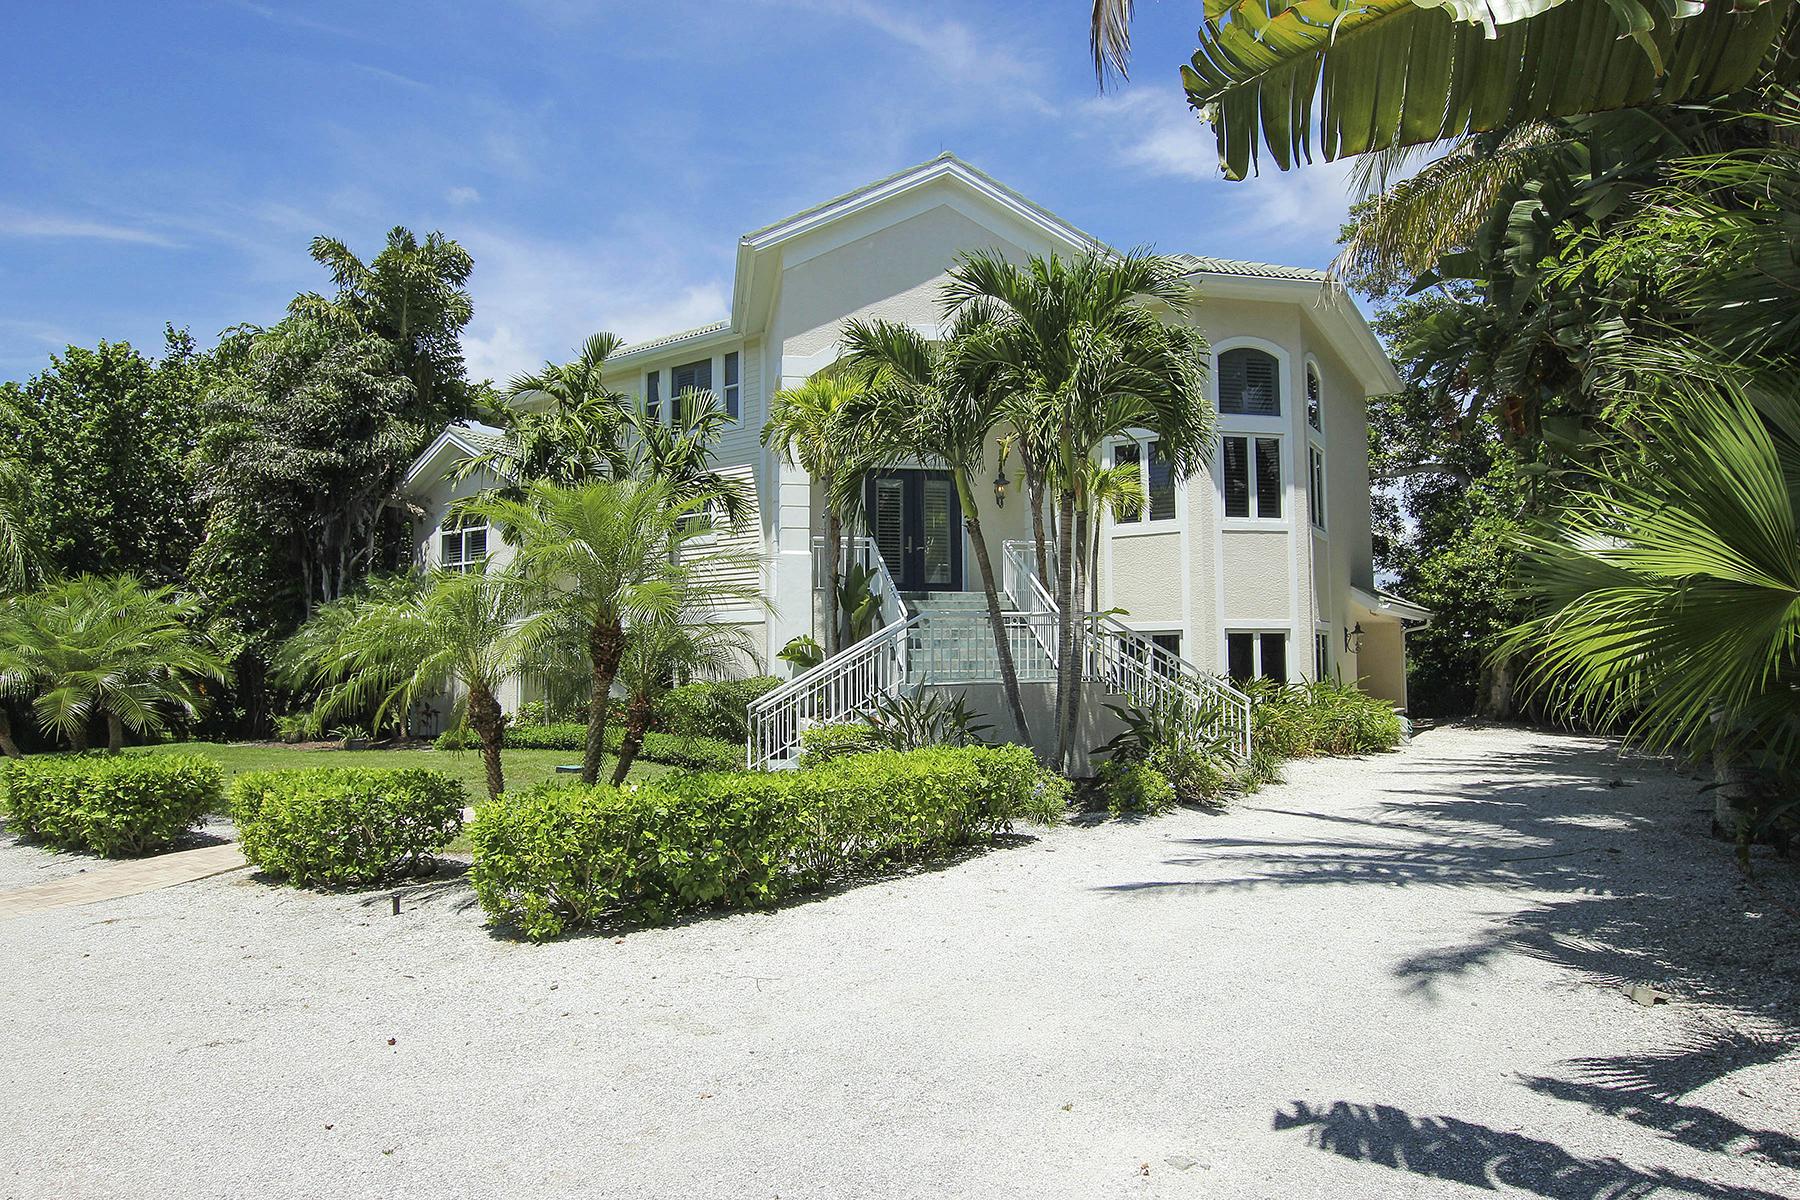 独户住宅 为 销售 在 16447 Captiva Dr , Captiva, FL 33924 16447 Captiva Dr 科帕奇, 佛罗里达州, 33924 美国